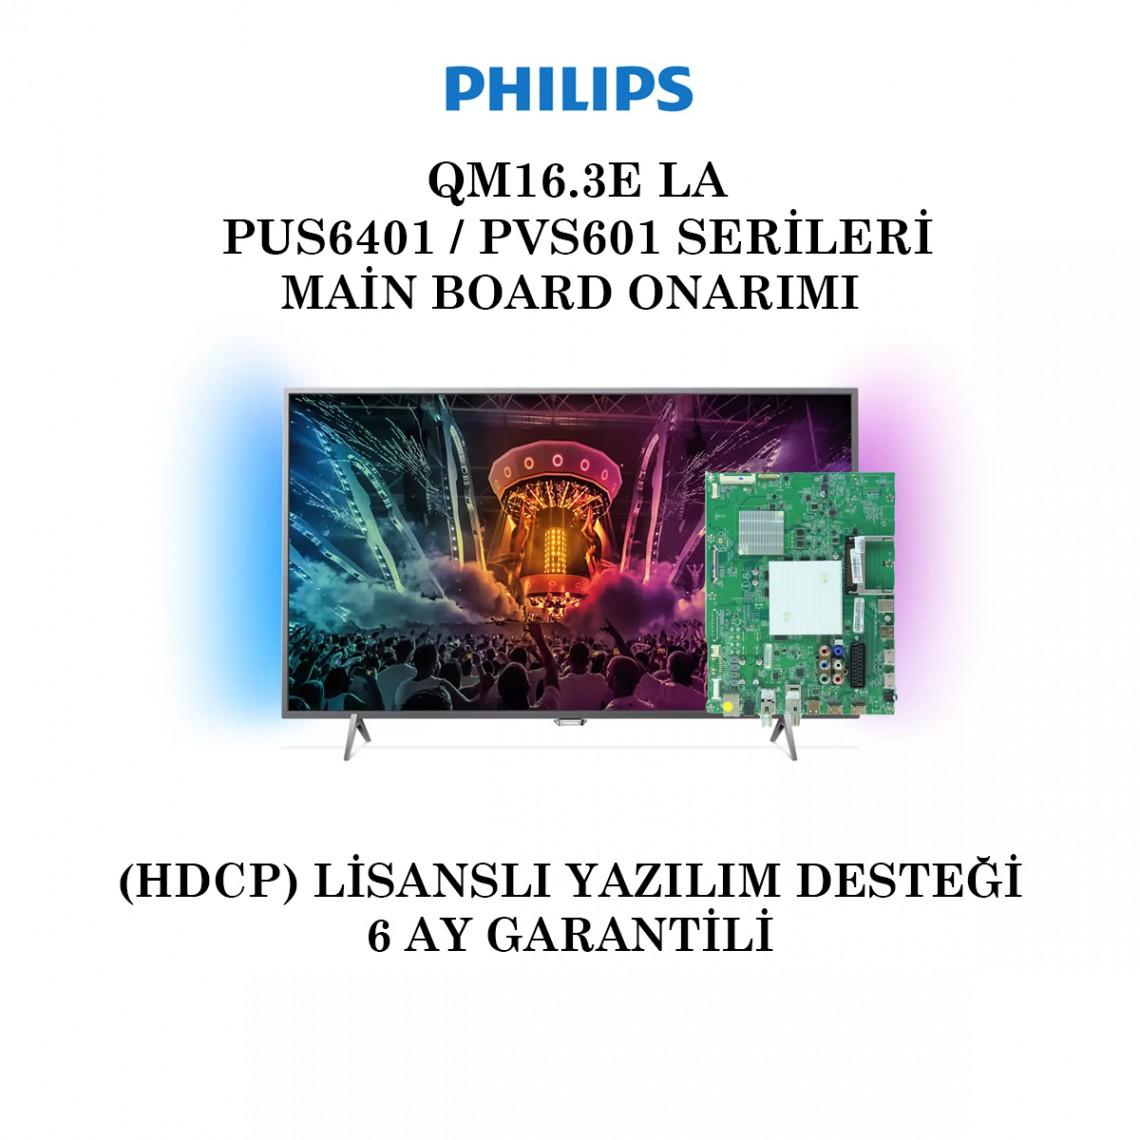 PHILIPS, QM16.3E, 715G7776-M01-B00-005K, 55PUS6401, 43PUS6401, 49PUS6401, 43PVS601, Main Board Onarımı